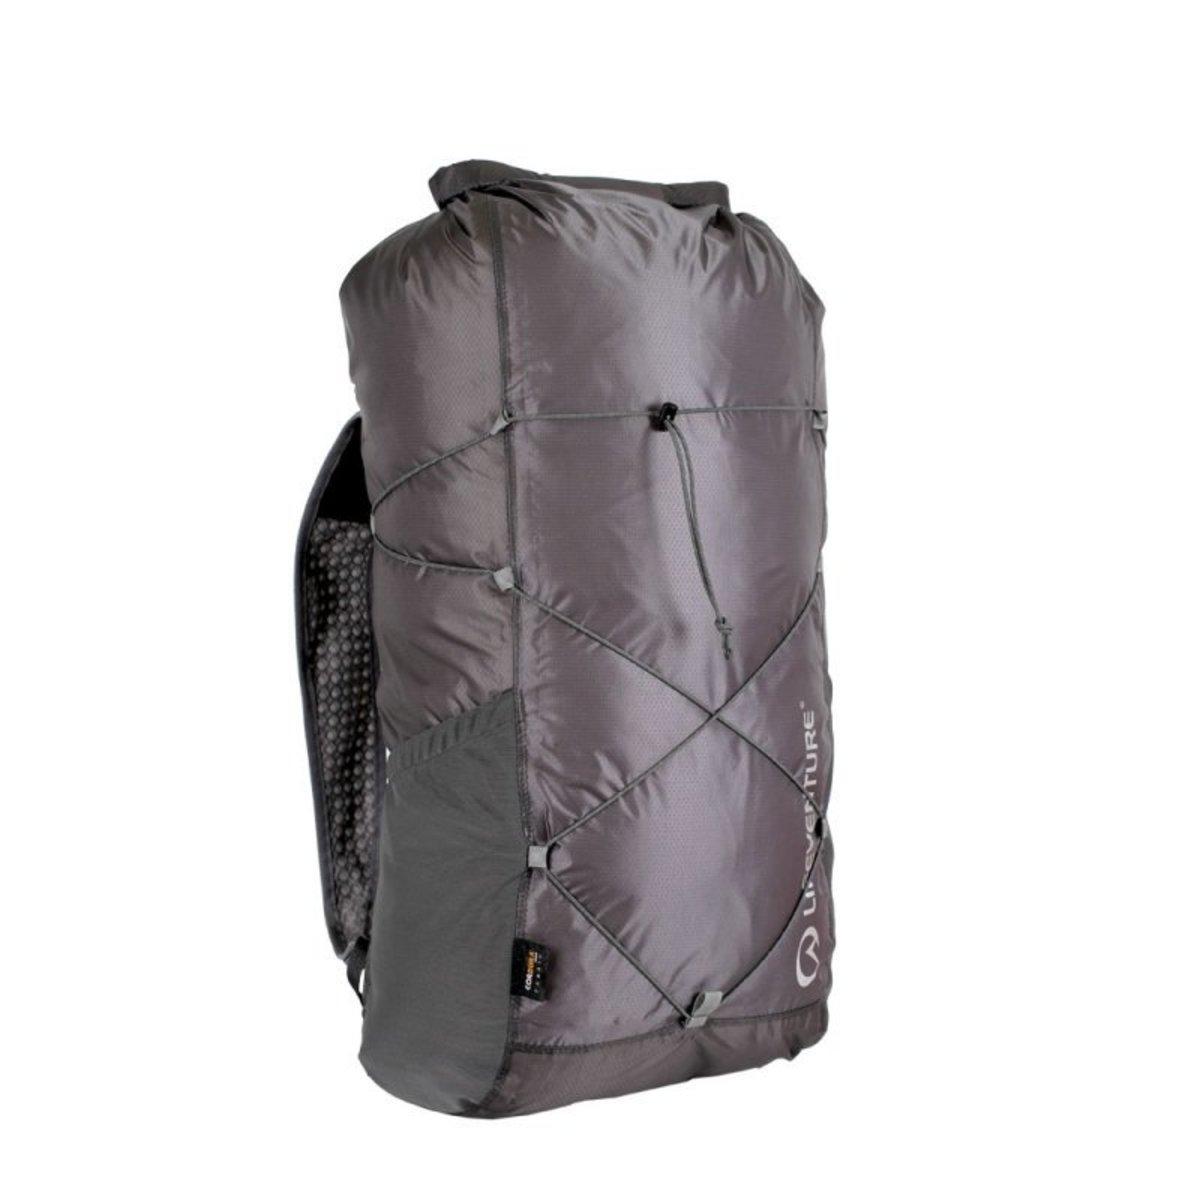 英國品牌防水背包 Packable Waterproof Backpack 22L